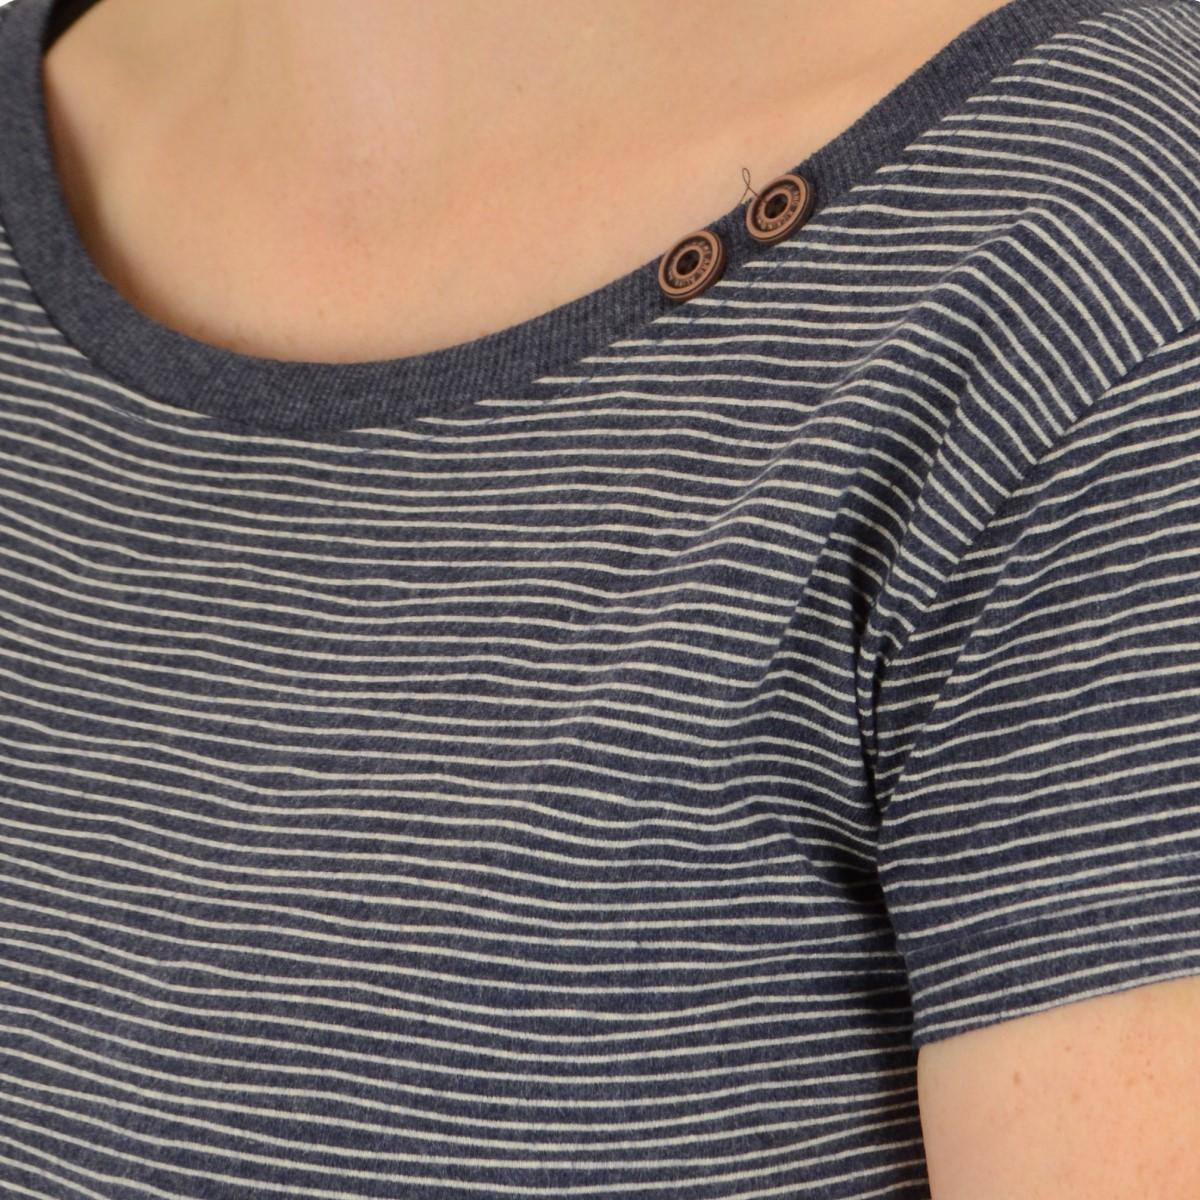 Alife and Kickin Damen T-Shirt COCO marine stripes